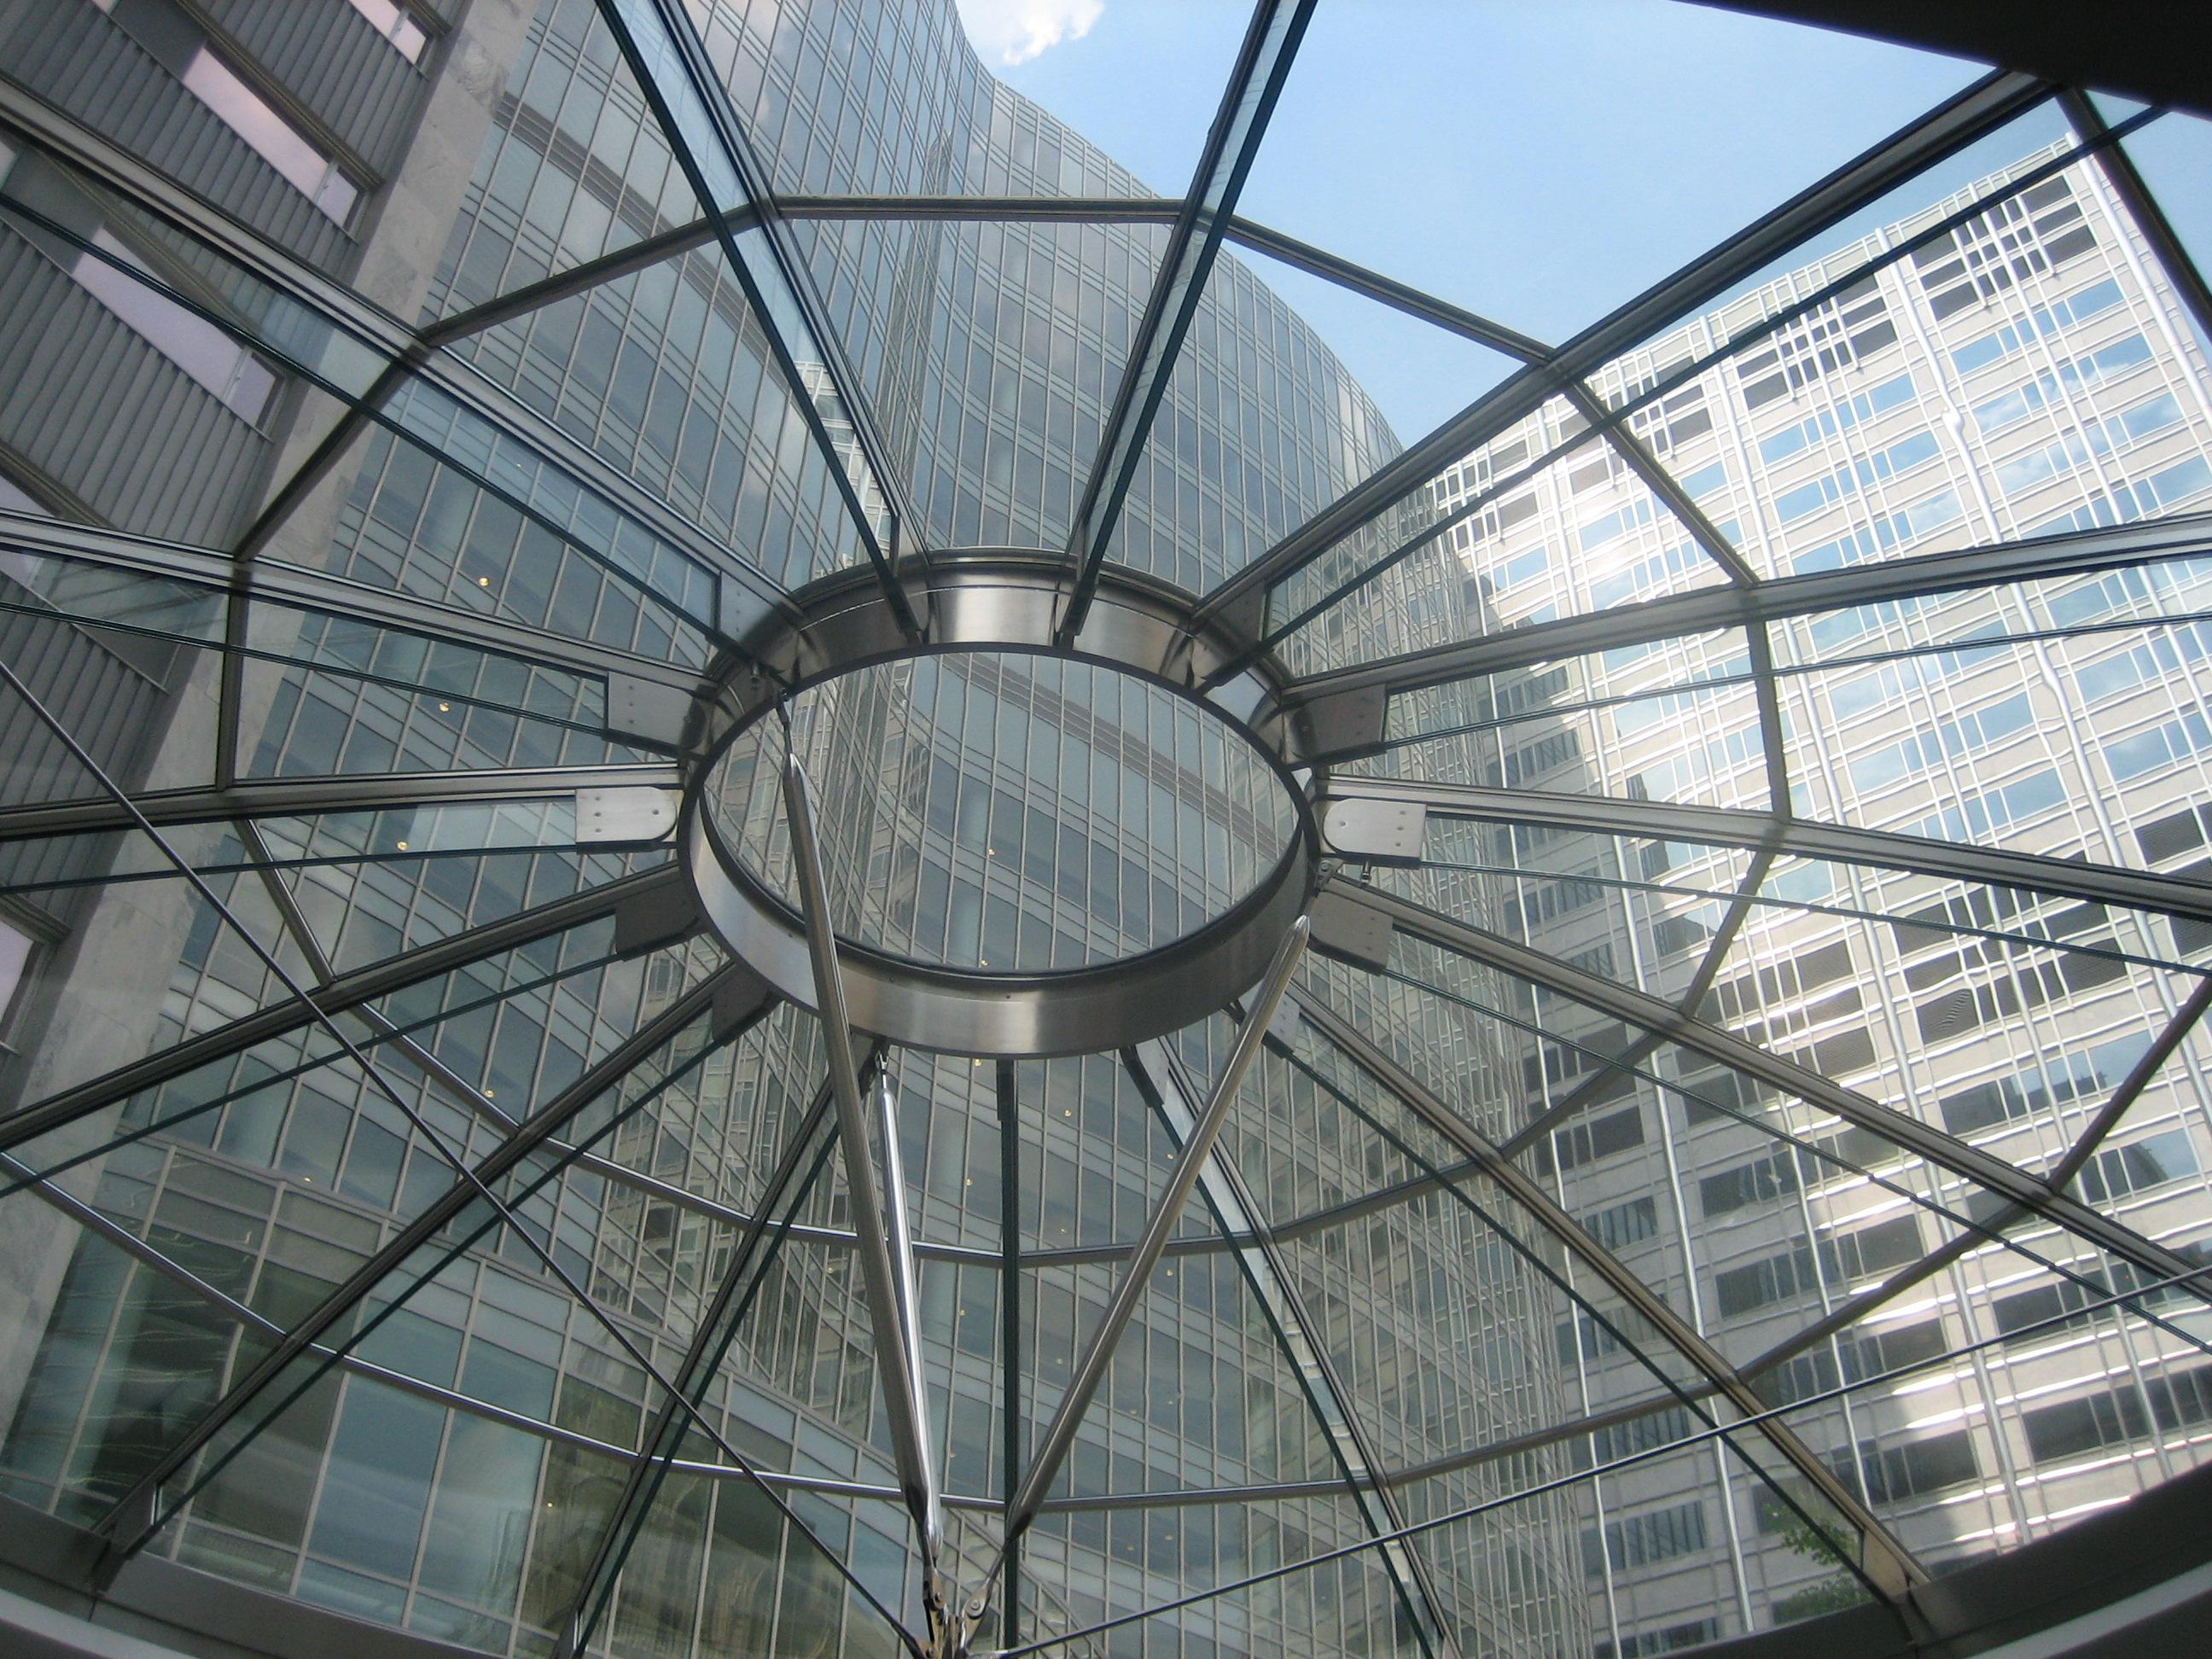 File:Mayo Clinic Gonda building 3997 jpg - Wikimedia Commons